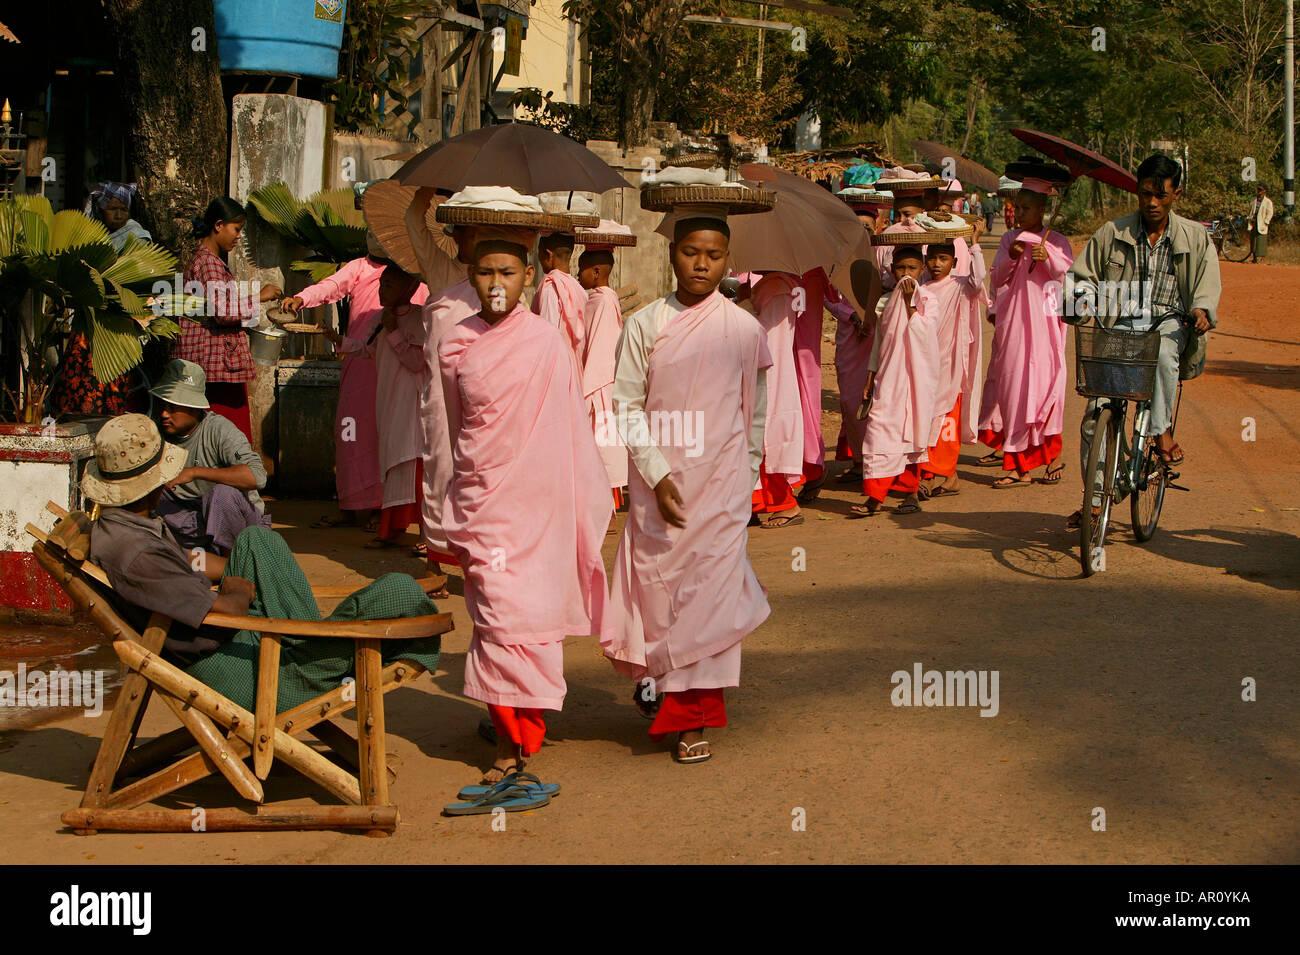 Nuns walk in a line to collect alms, Bago, Nonnen in rosa Roben, gehen in Reihe, Almosen sammeln, bekommen ungekochten Reis, Moe - Stock Image